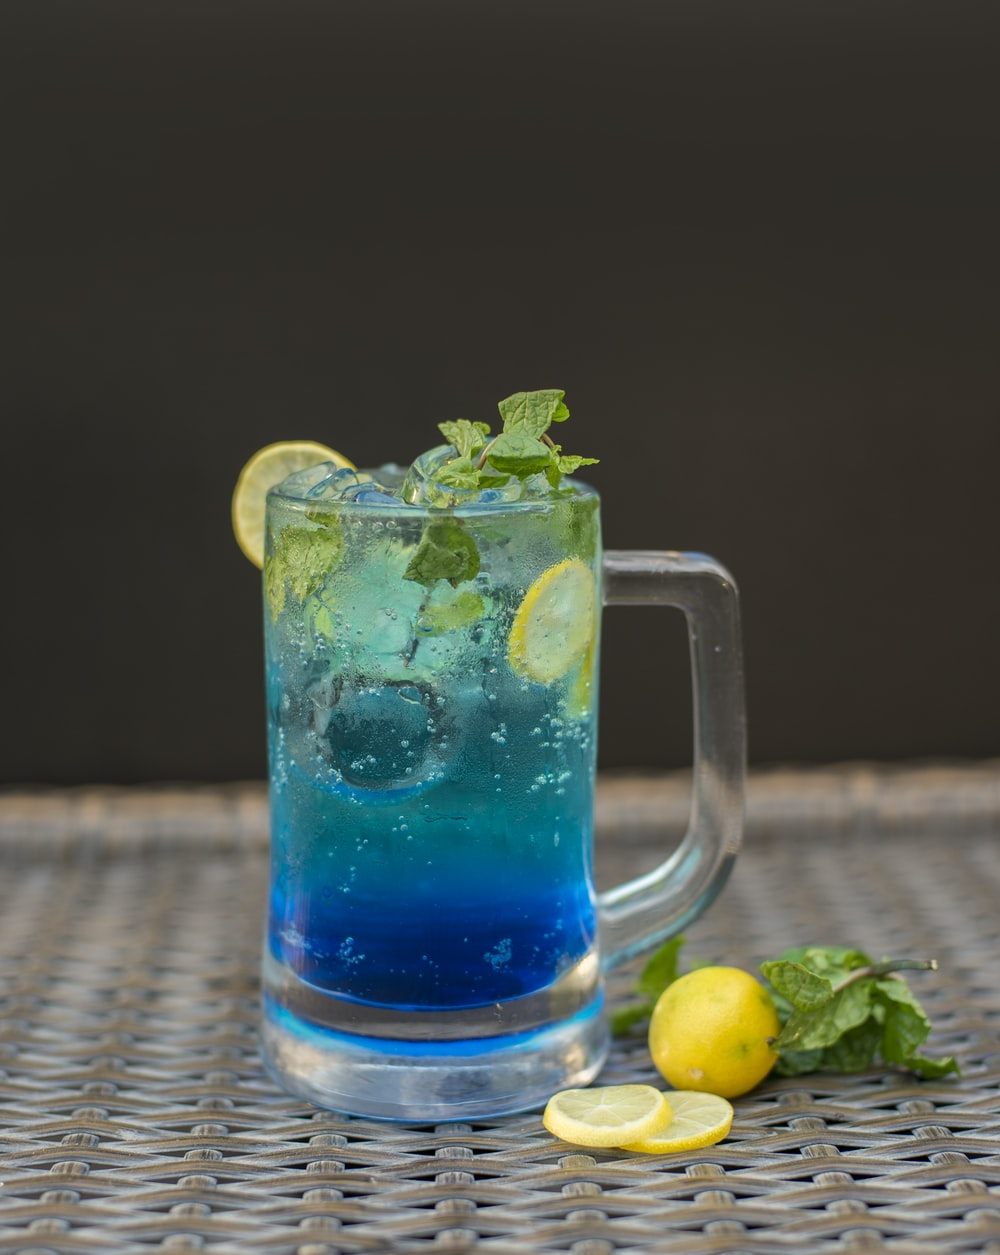 clear glass mug with blue liquid